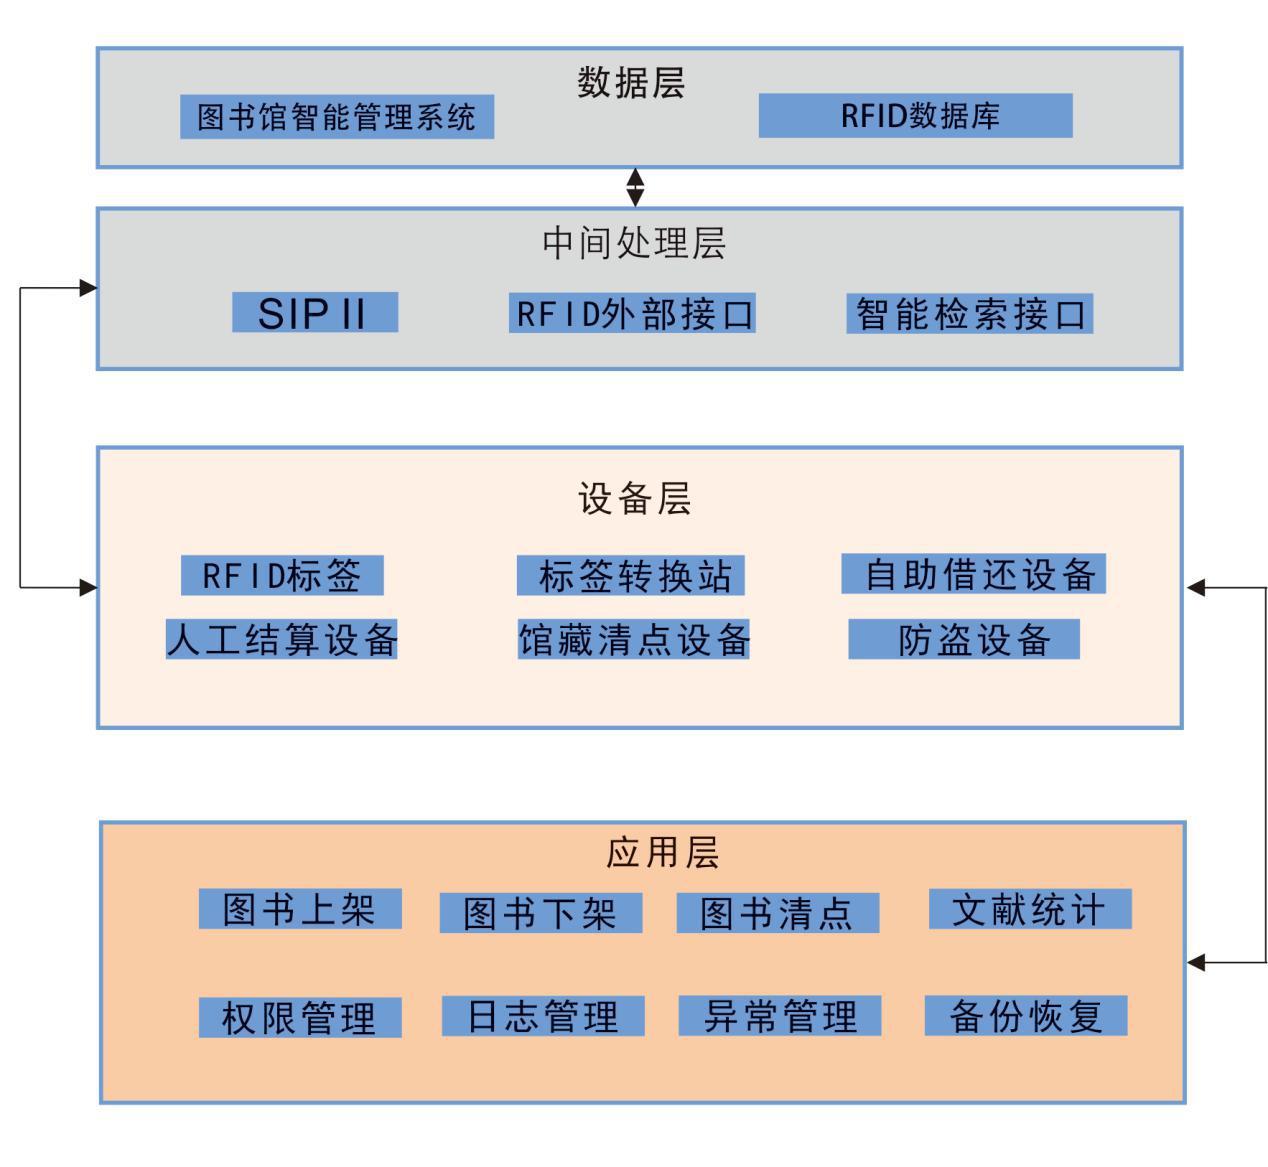 RFID图书馆管理系统